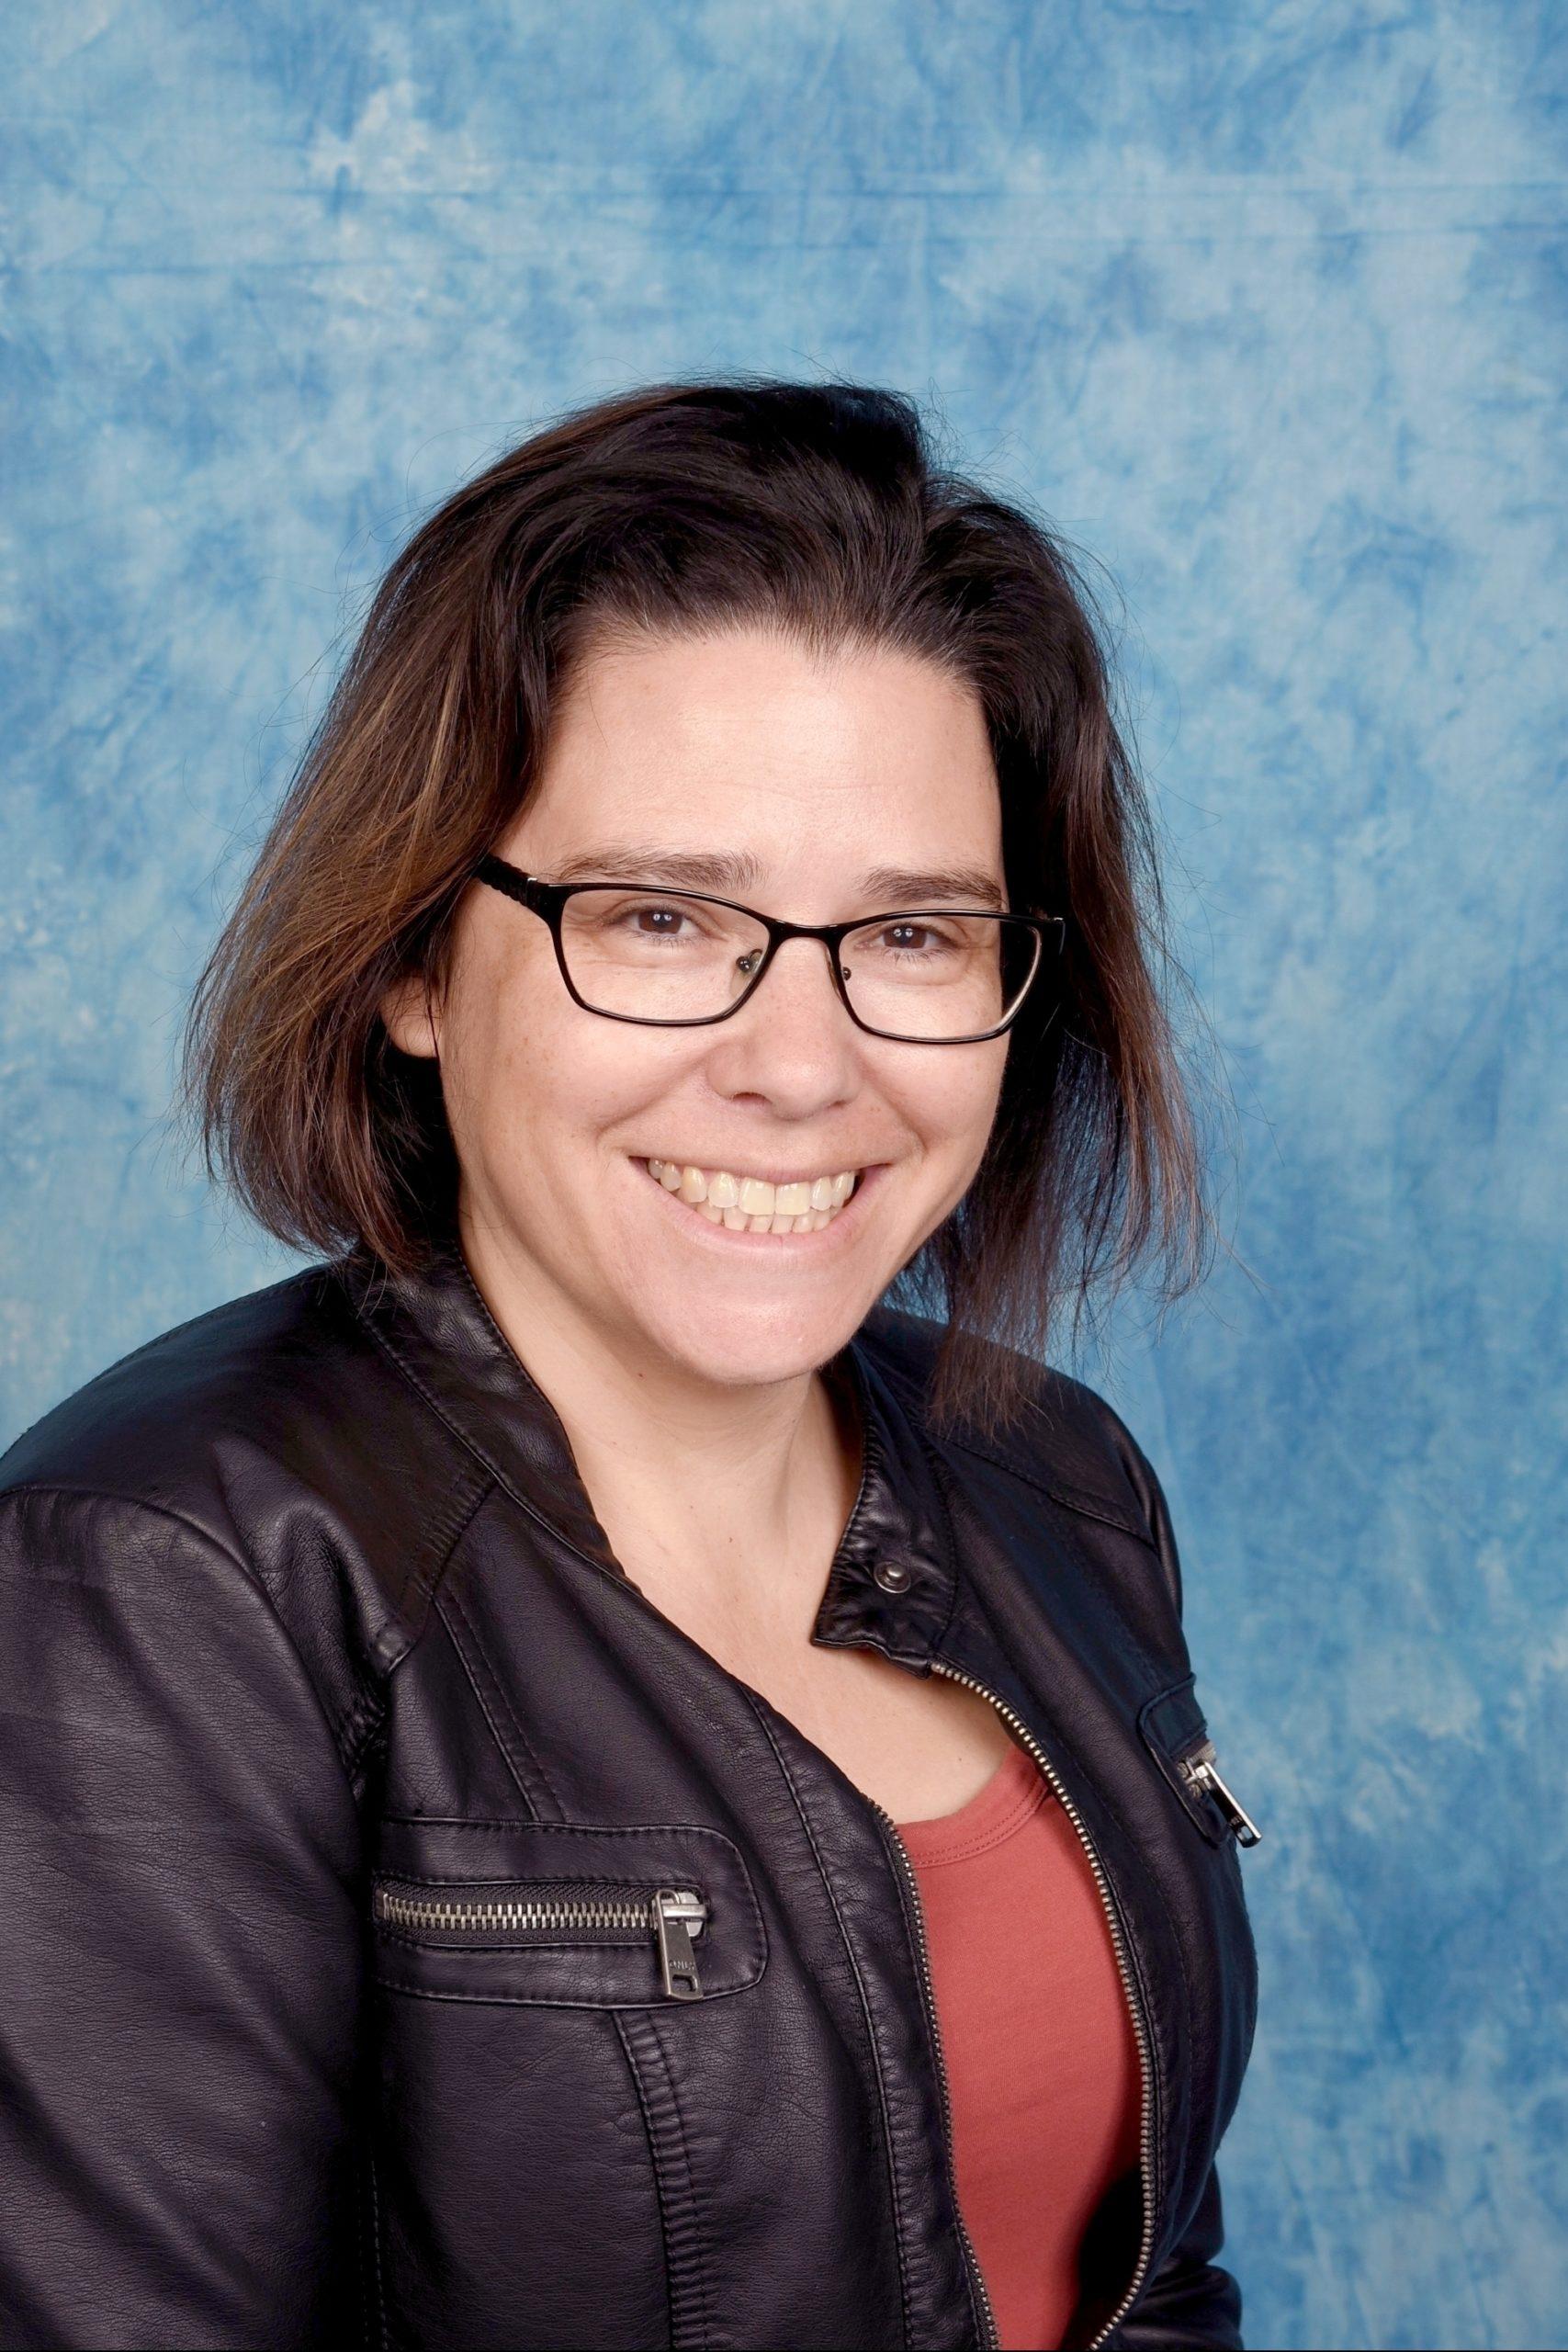 Janelle Morris